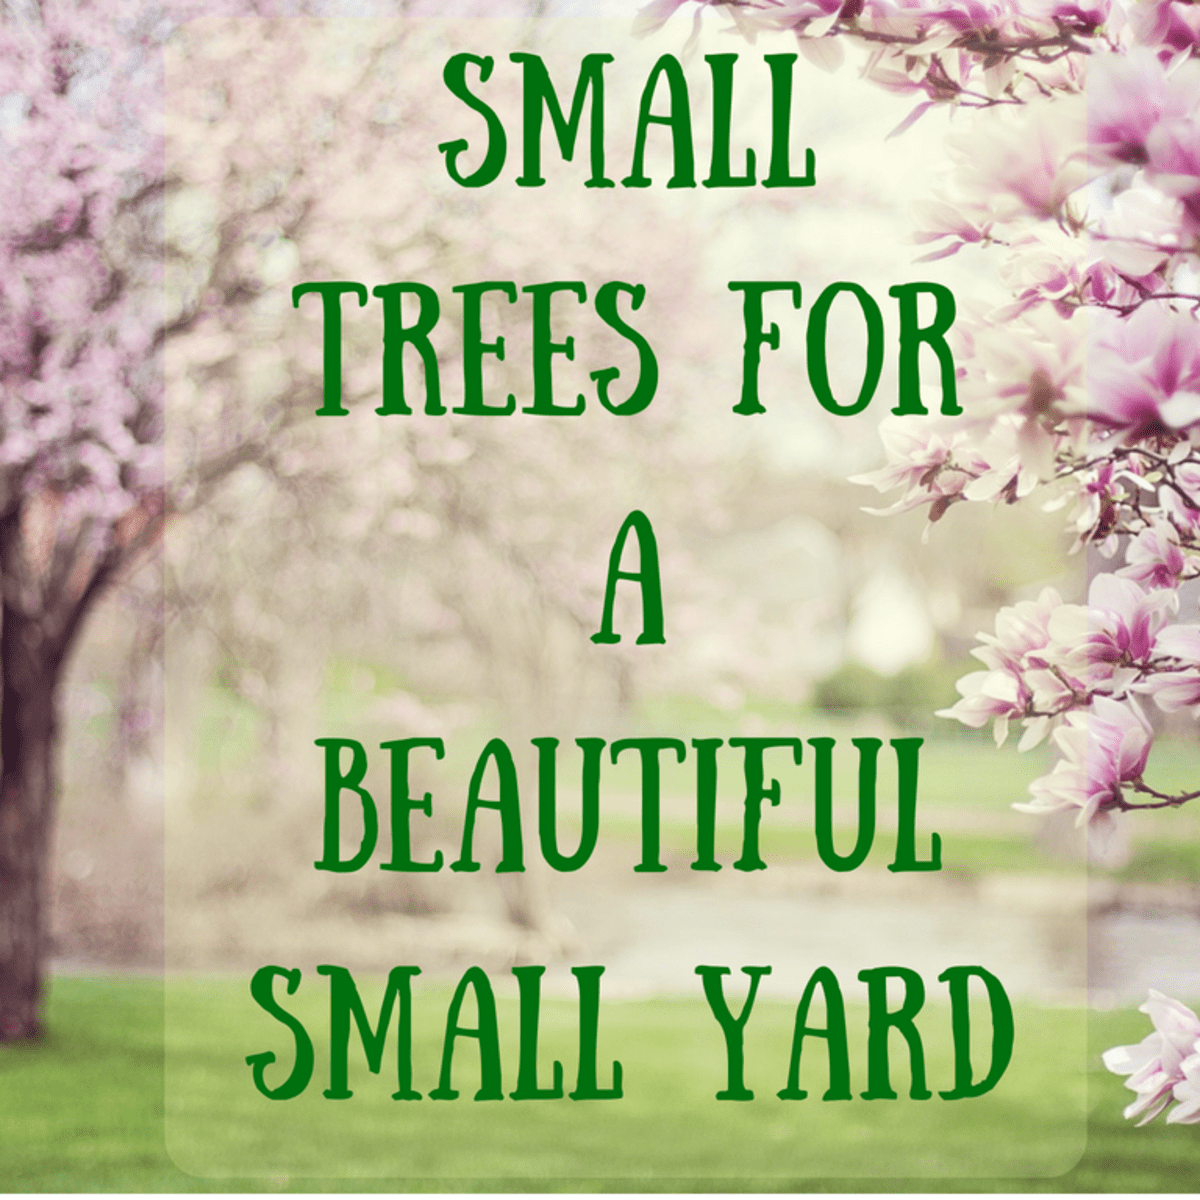 39 Small Trees Under 30 Feet For A Small Yard Or Garden Dengarden Home And Garden